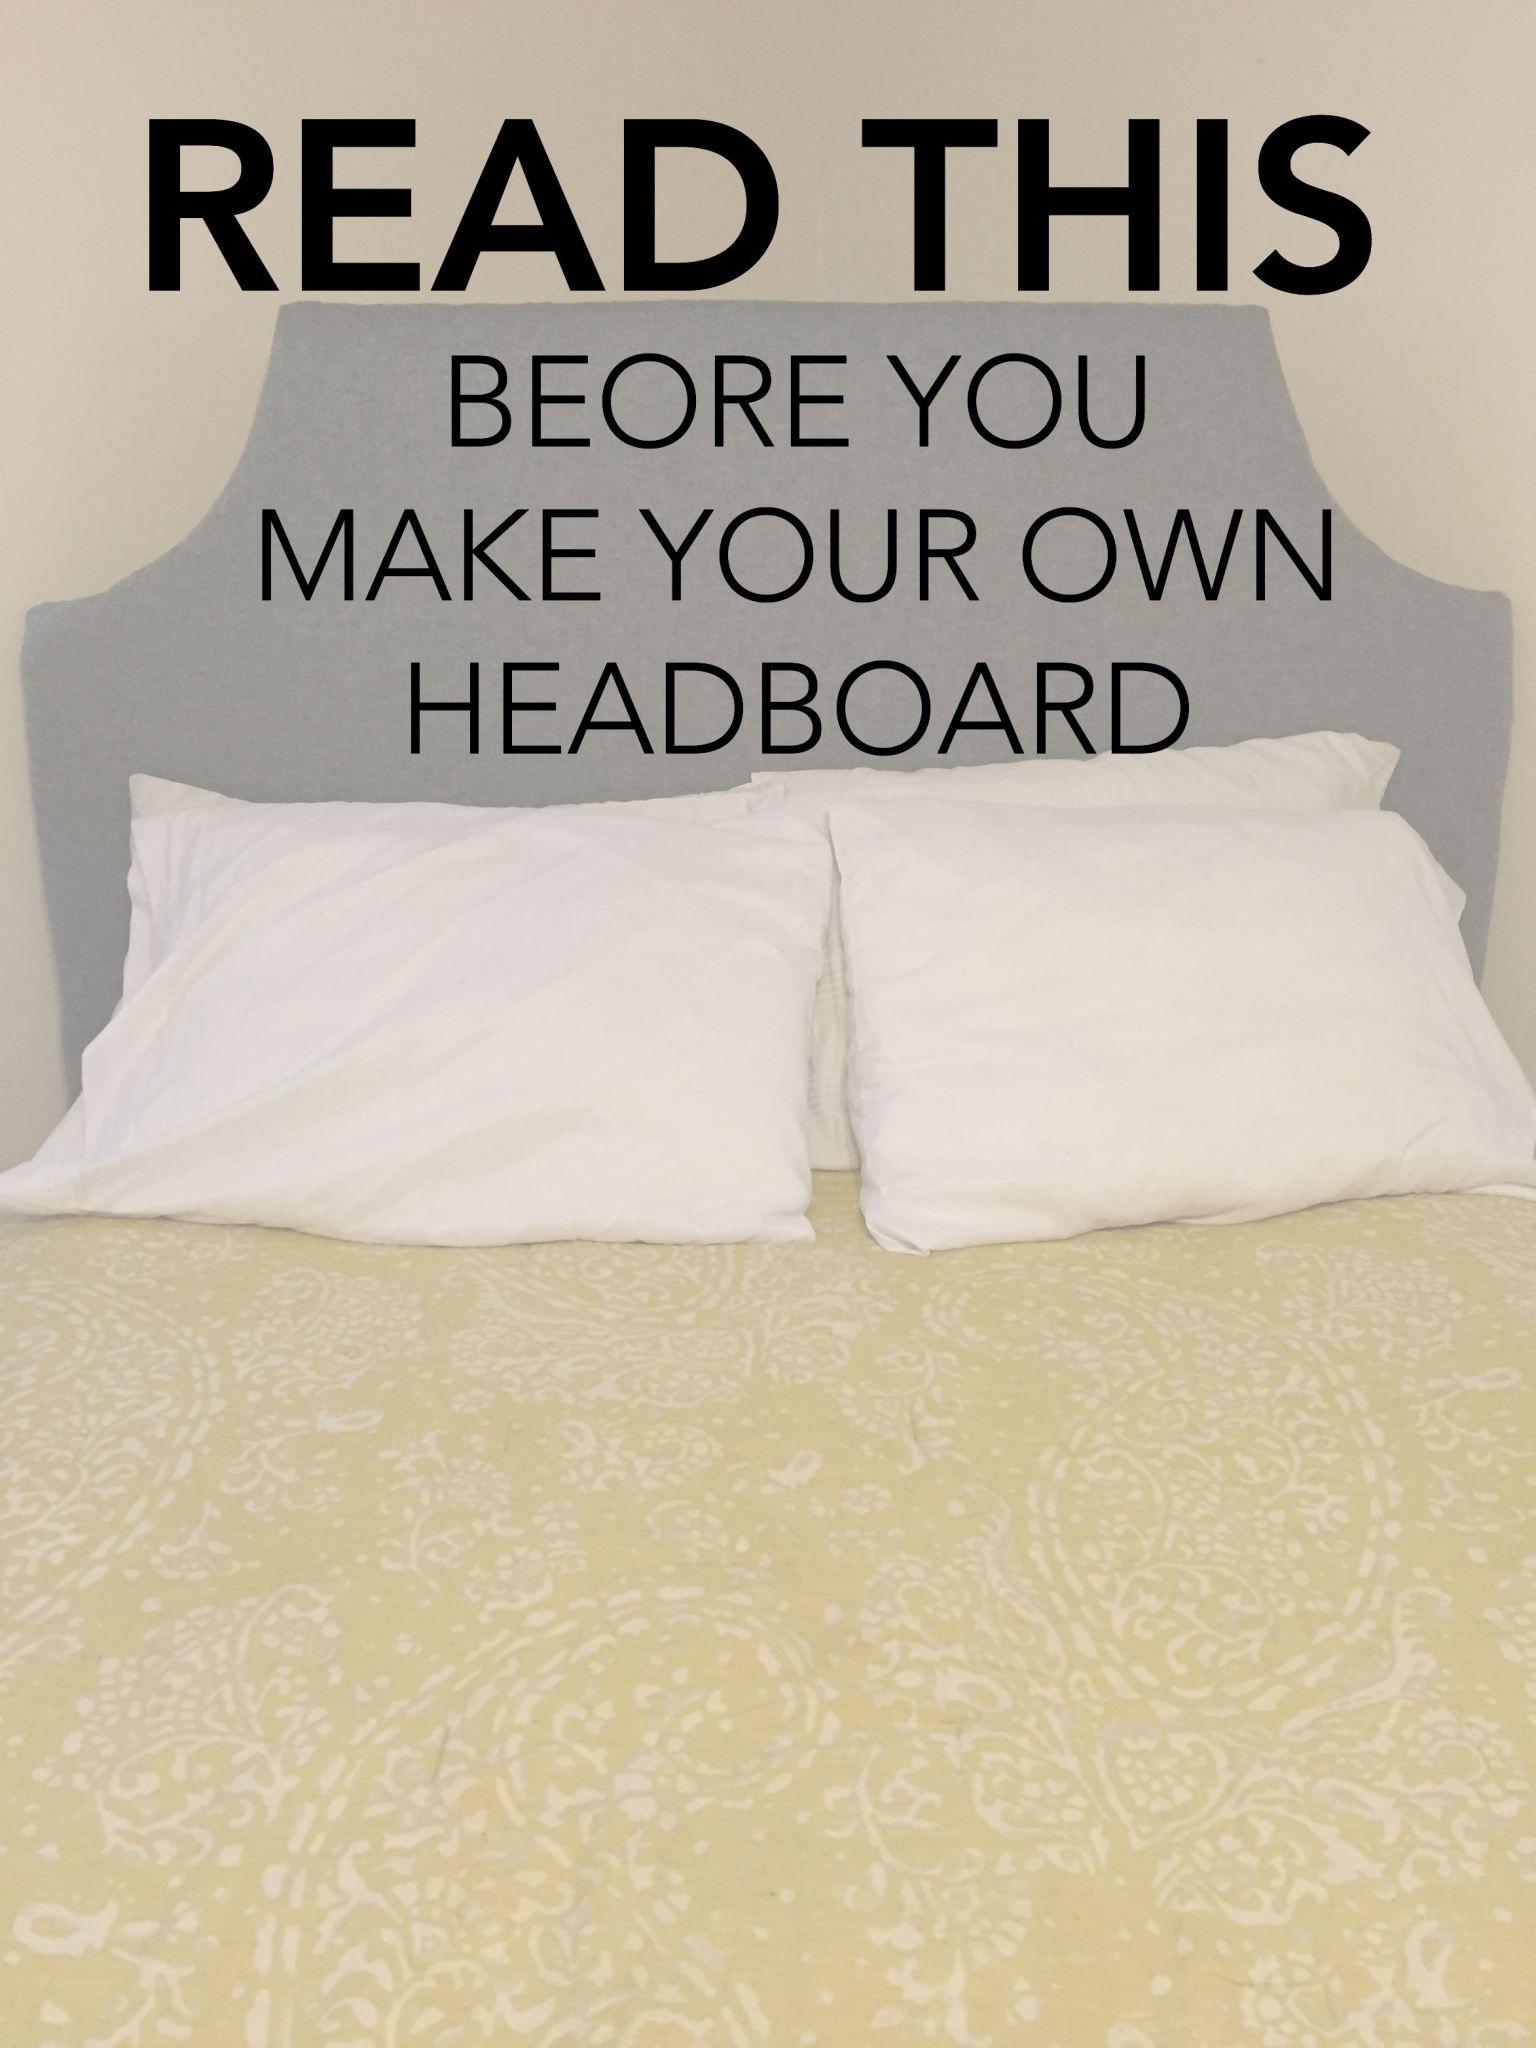 Readthisbeforeyoumakeyourownheadboard diy bed design